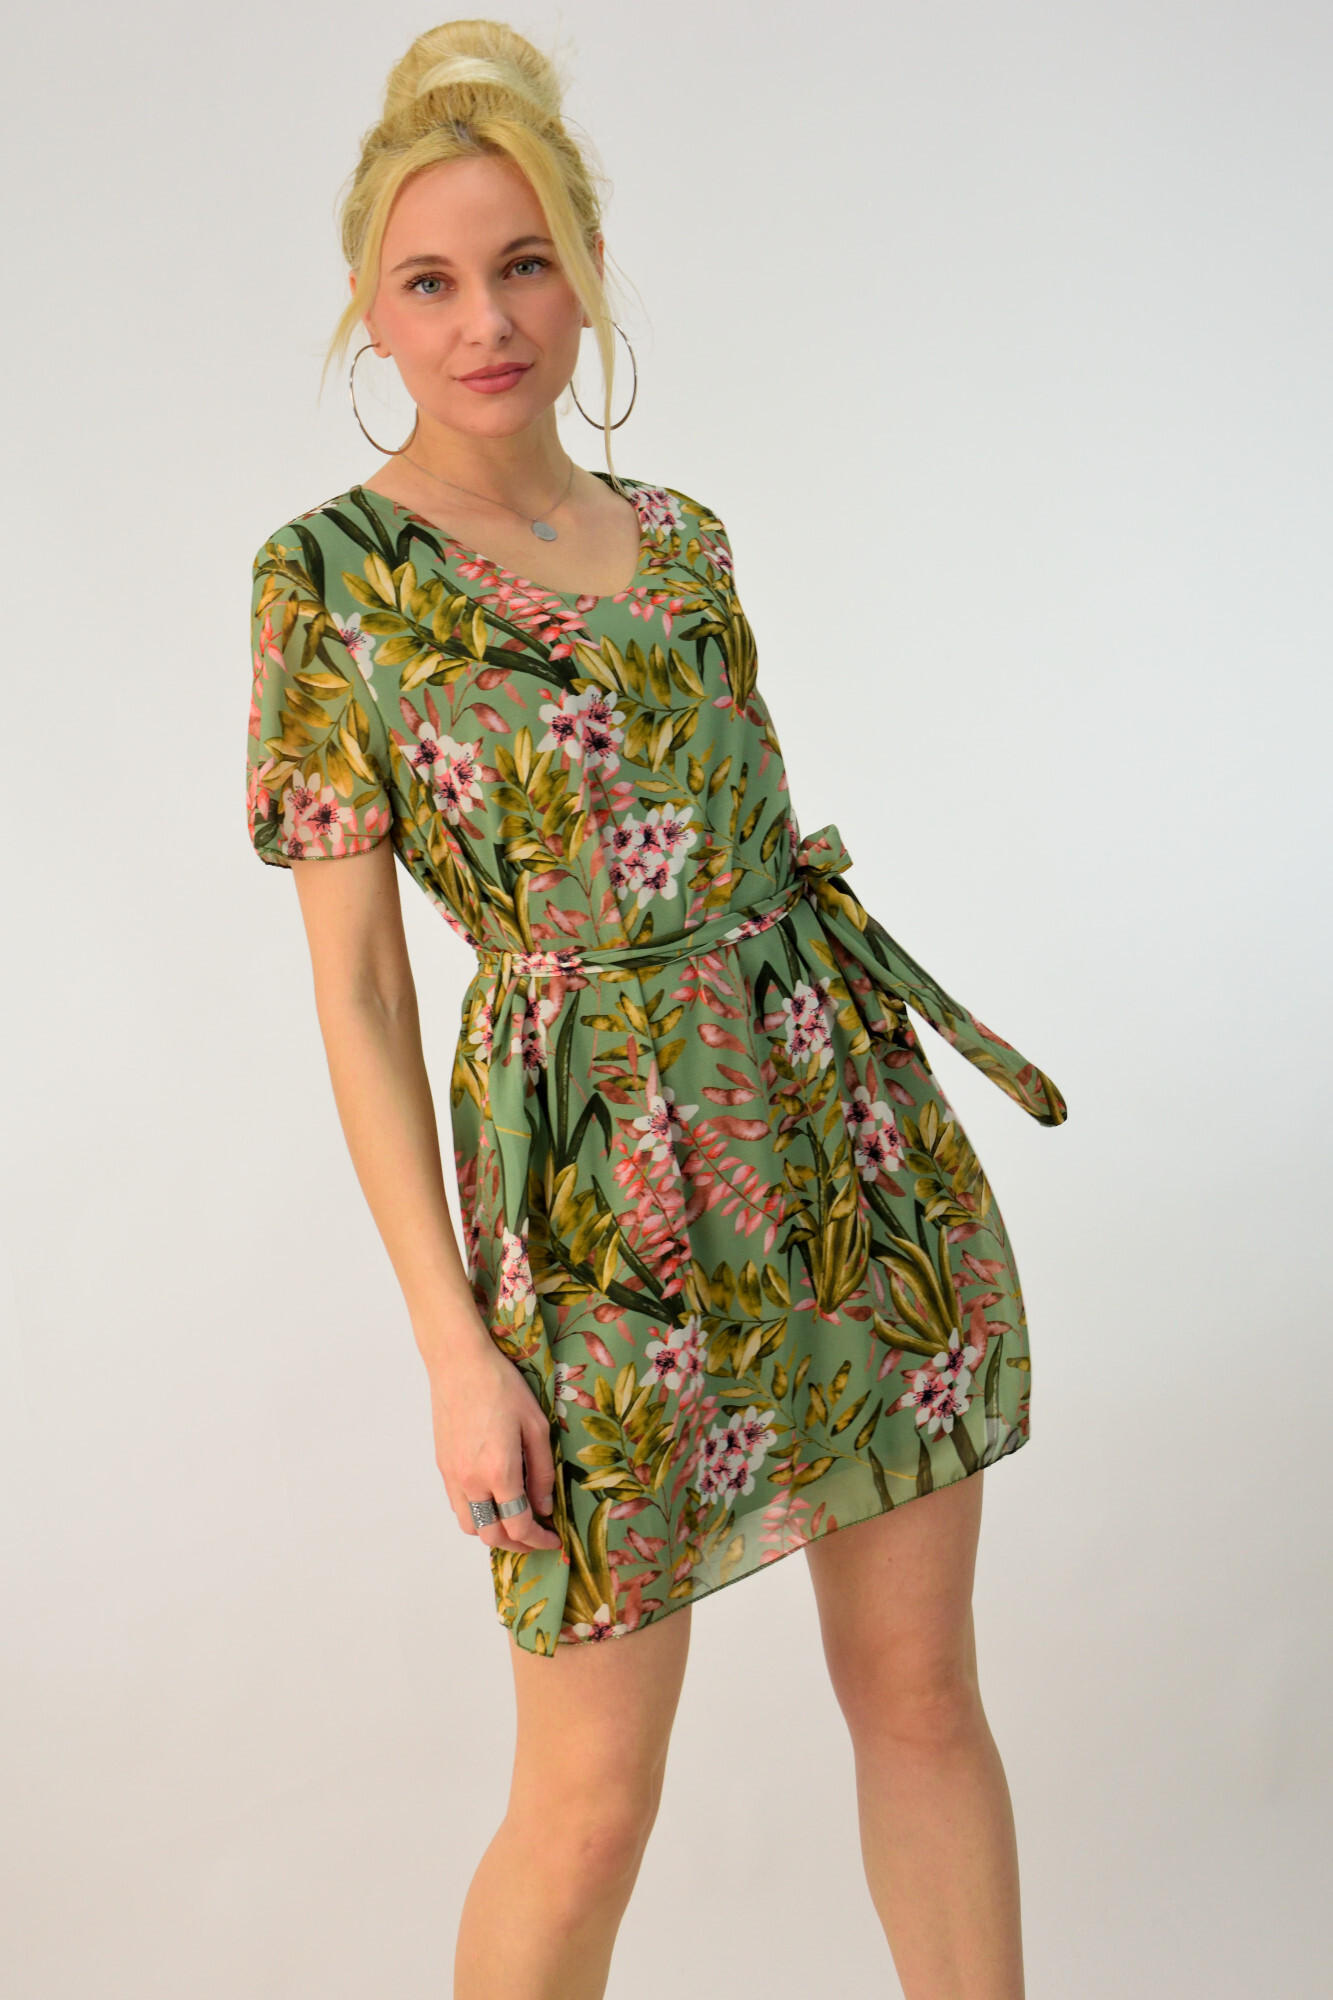 a53d0b959a0a Μίνι φλοράλ φόρεμα